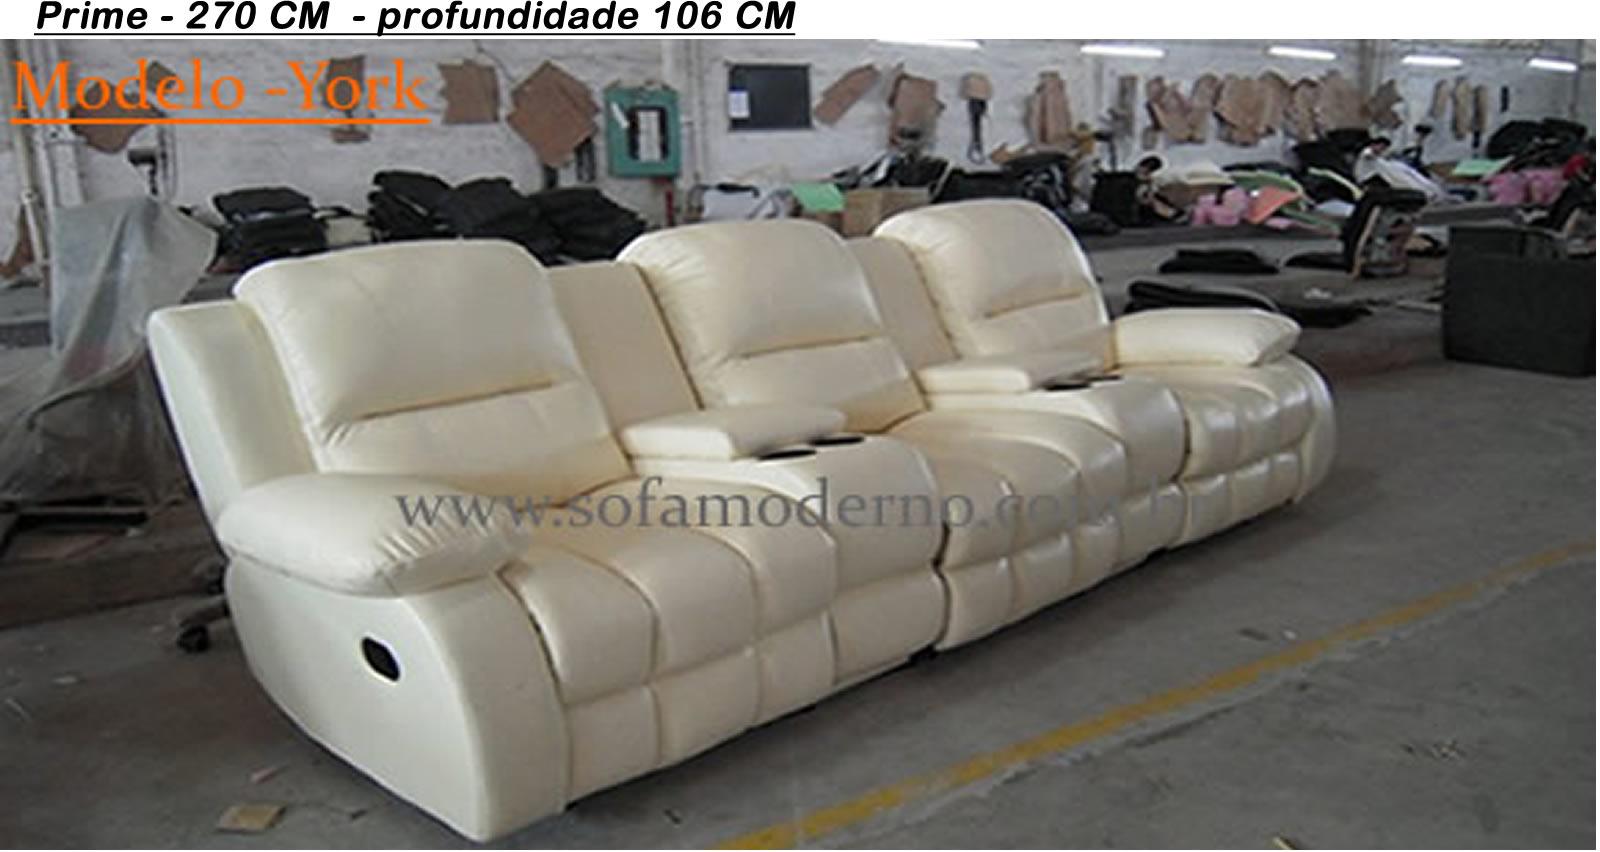 sof de f brica venda direta de estofados sofamoderno On fabrica de sofas en montevideo